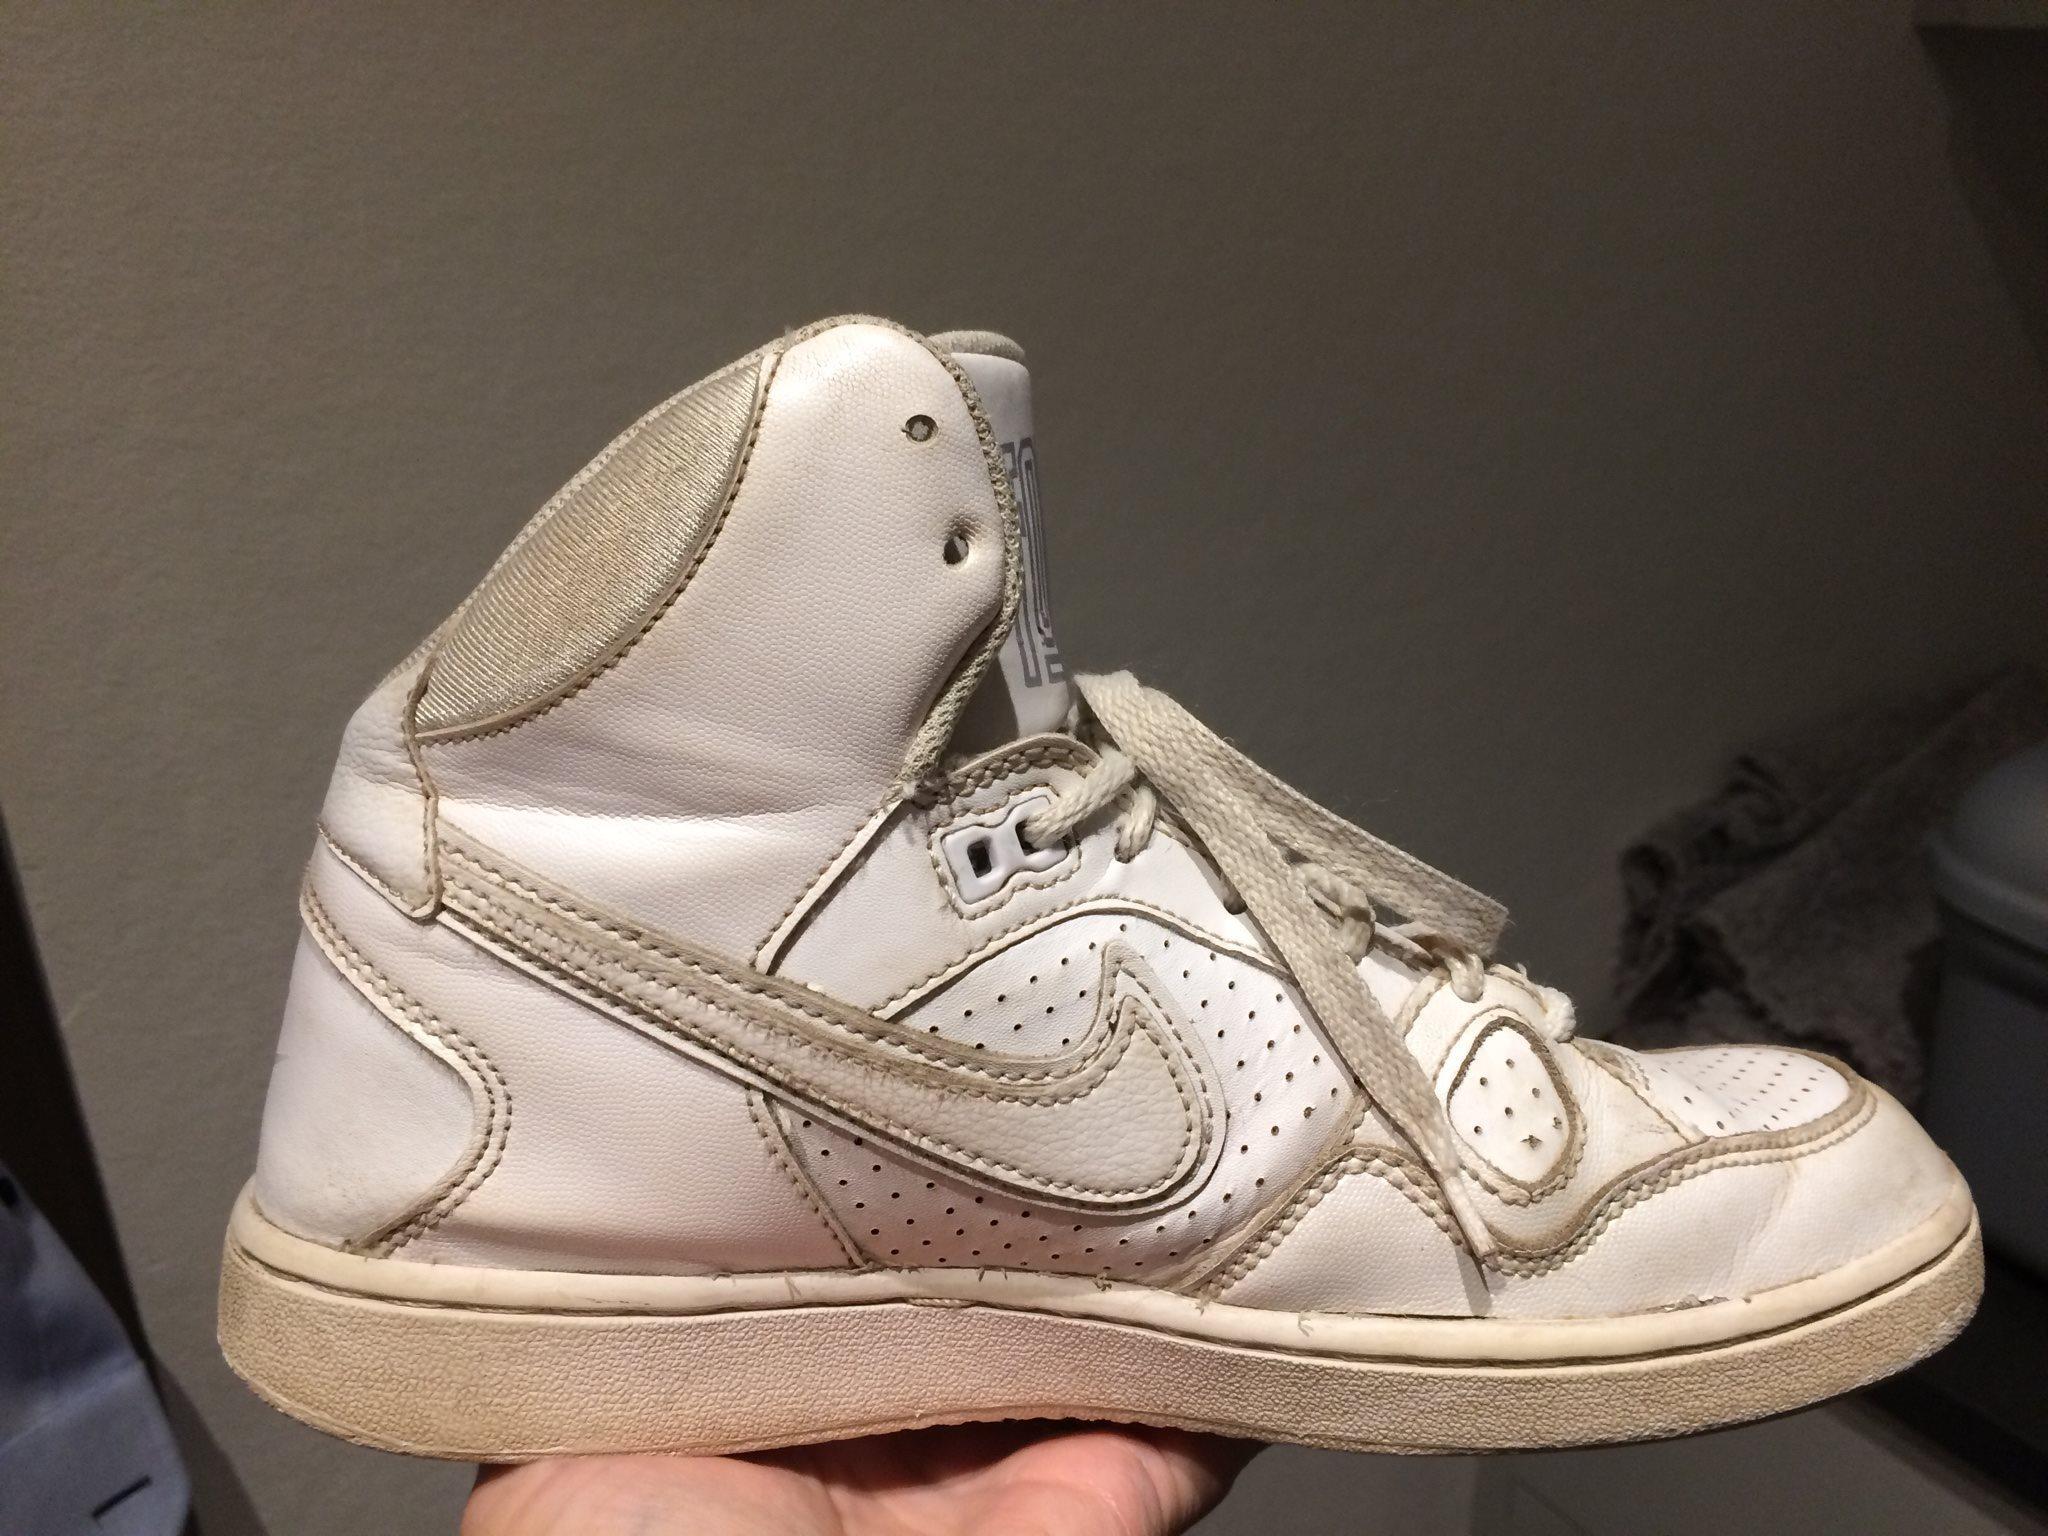 hot sales 674c0 86c00 st skor dam höga sneakers 321722005 Air 1 tjej Nike Force AvxU7